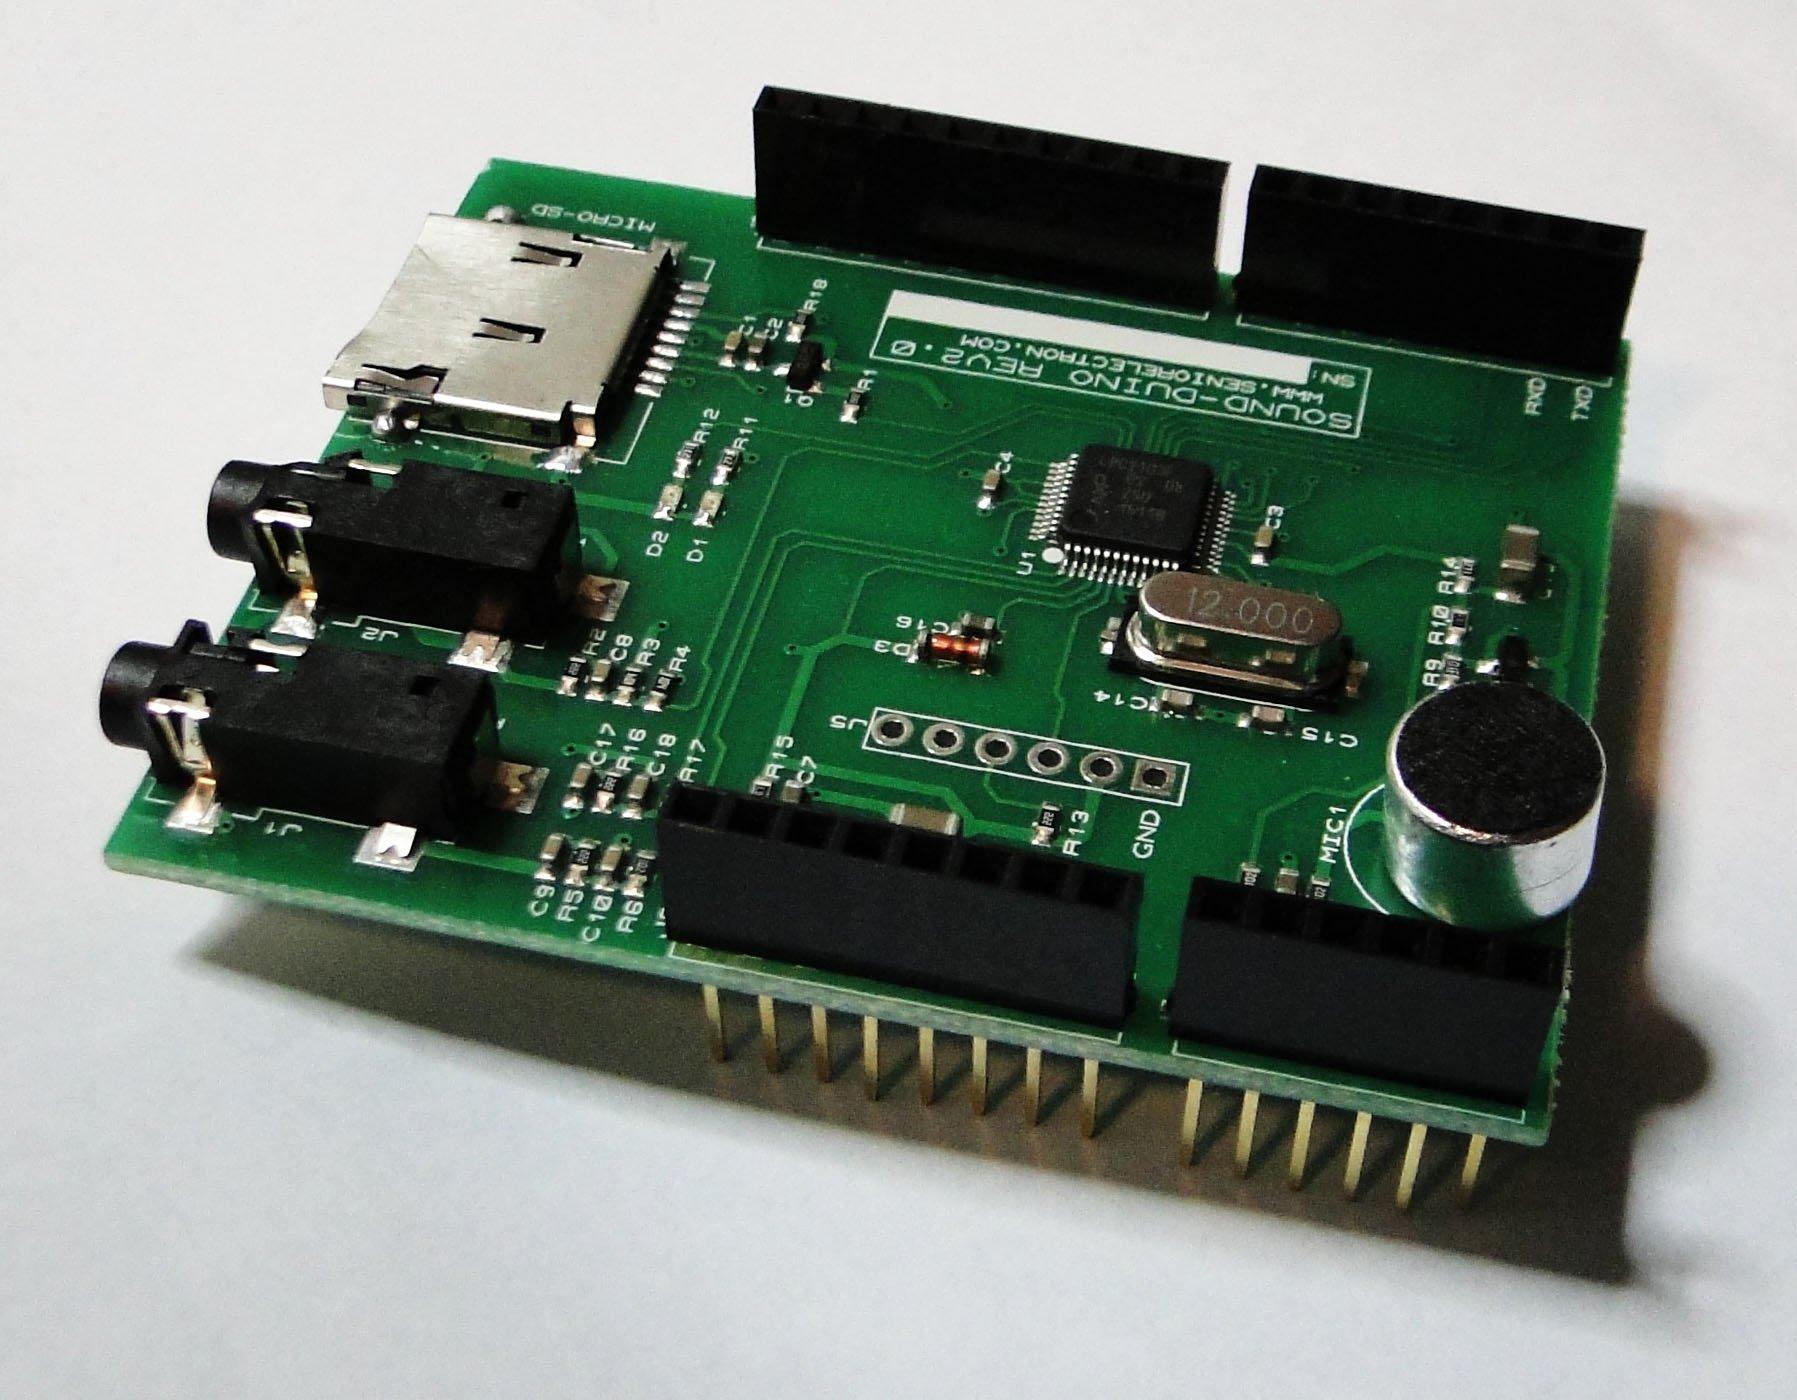 Soundduino audio shield for arduino from masihvahida on